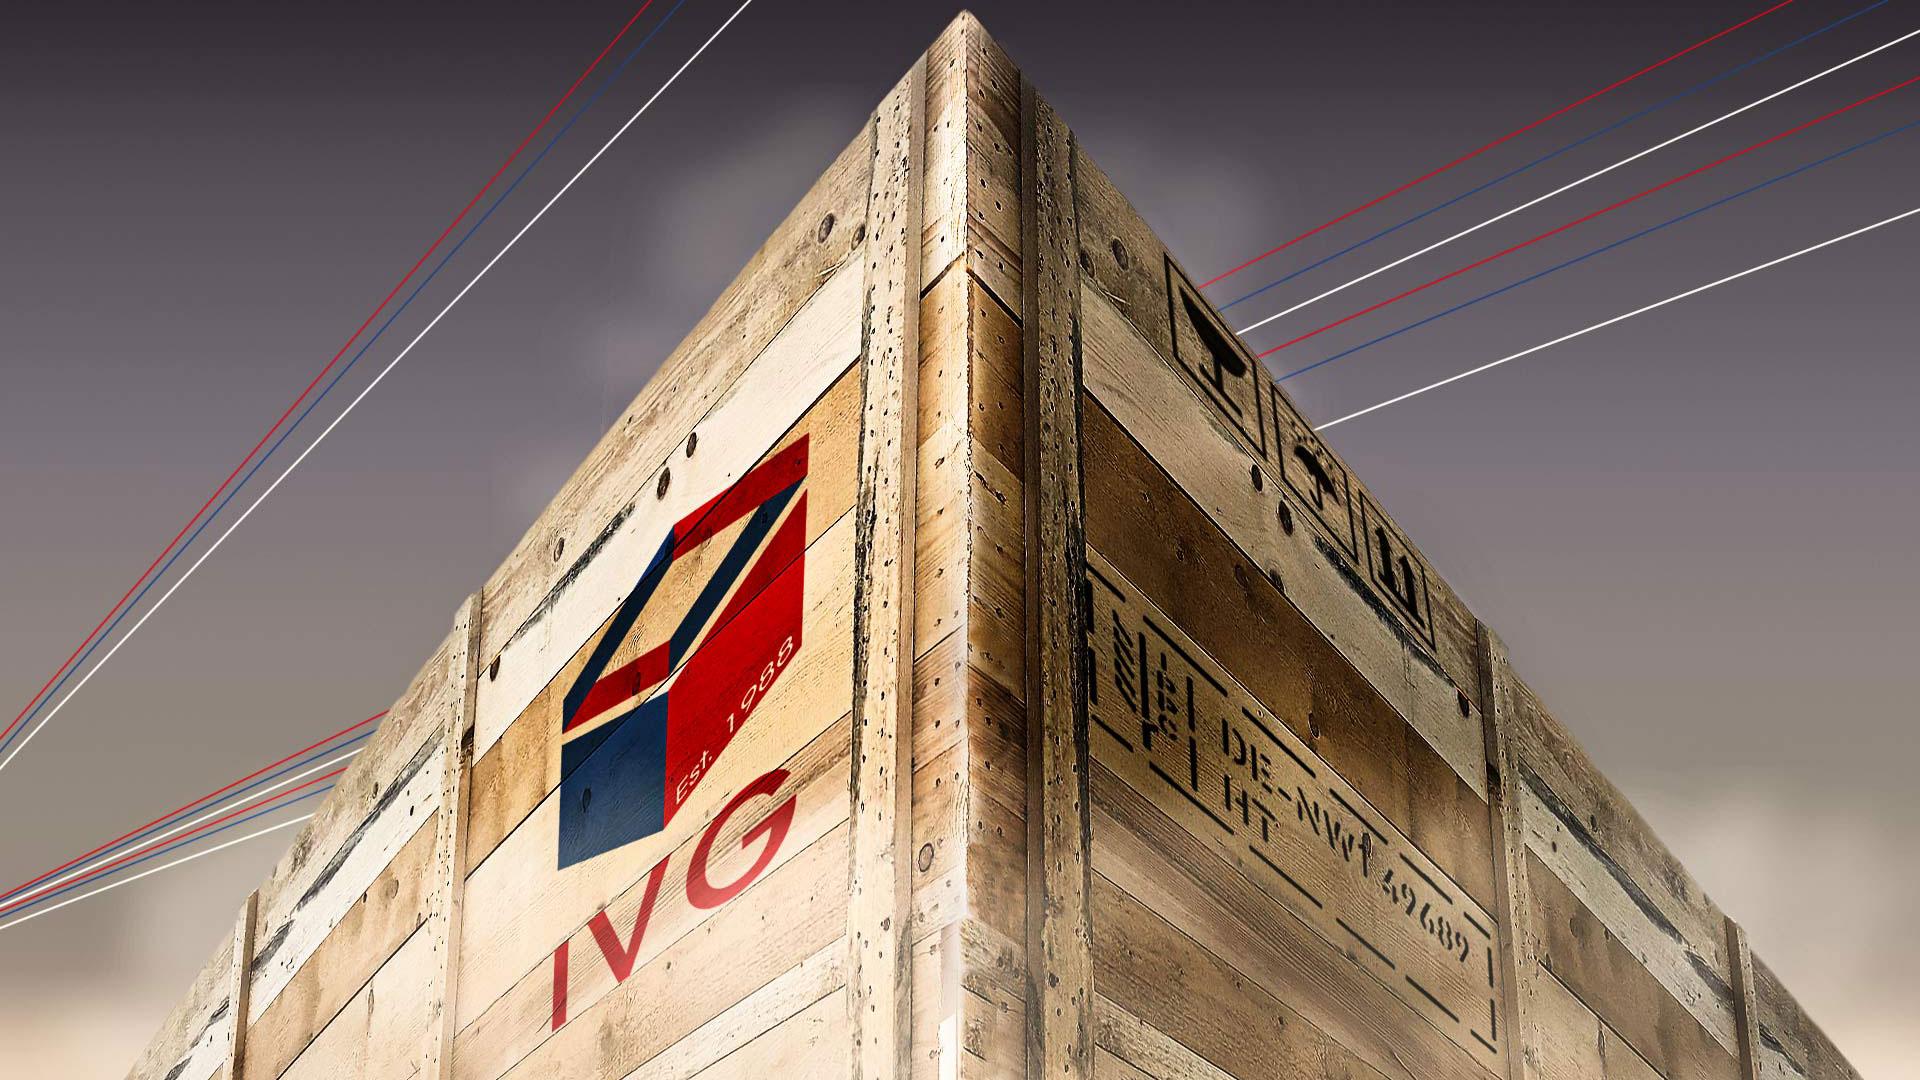 Startbild der IVG-der Verpacker -Holz Verpackungskiste der Ivg